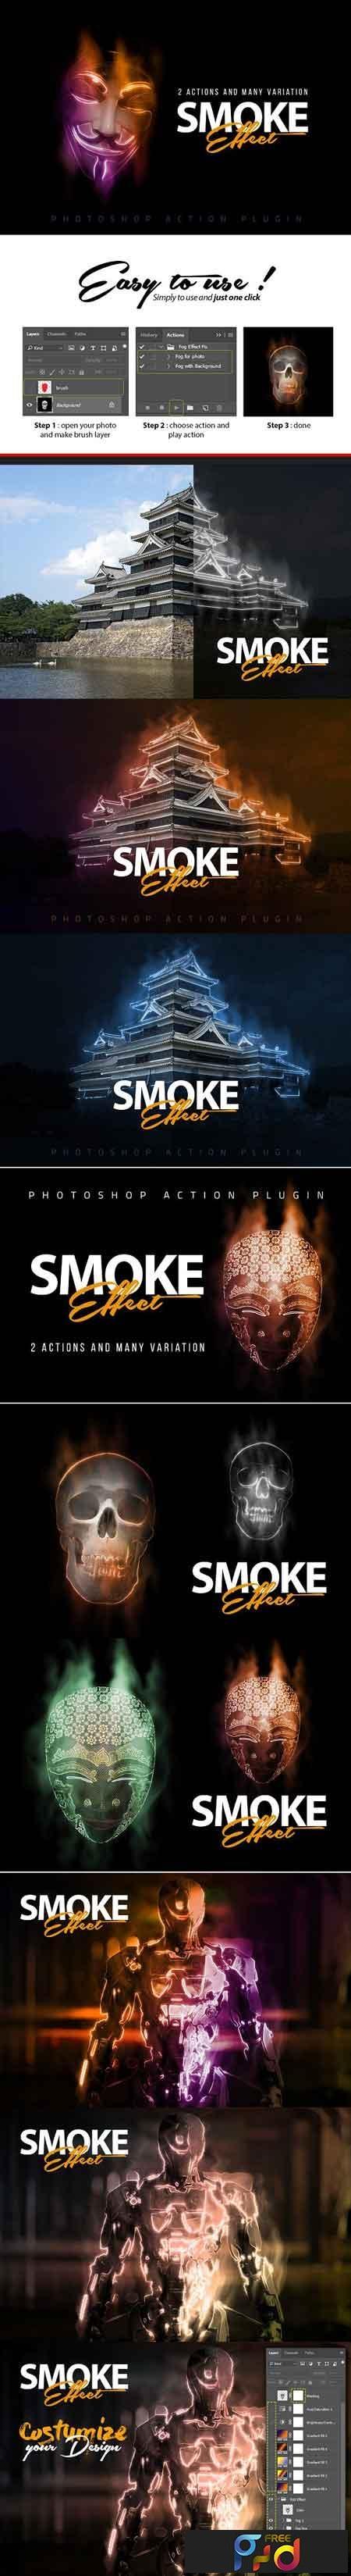 Smoke Effect Photoshop Action 2897739 1